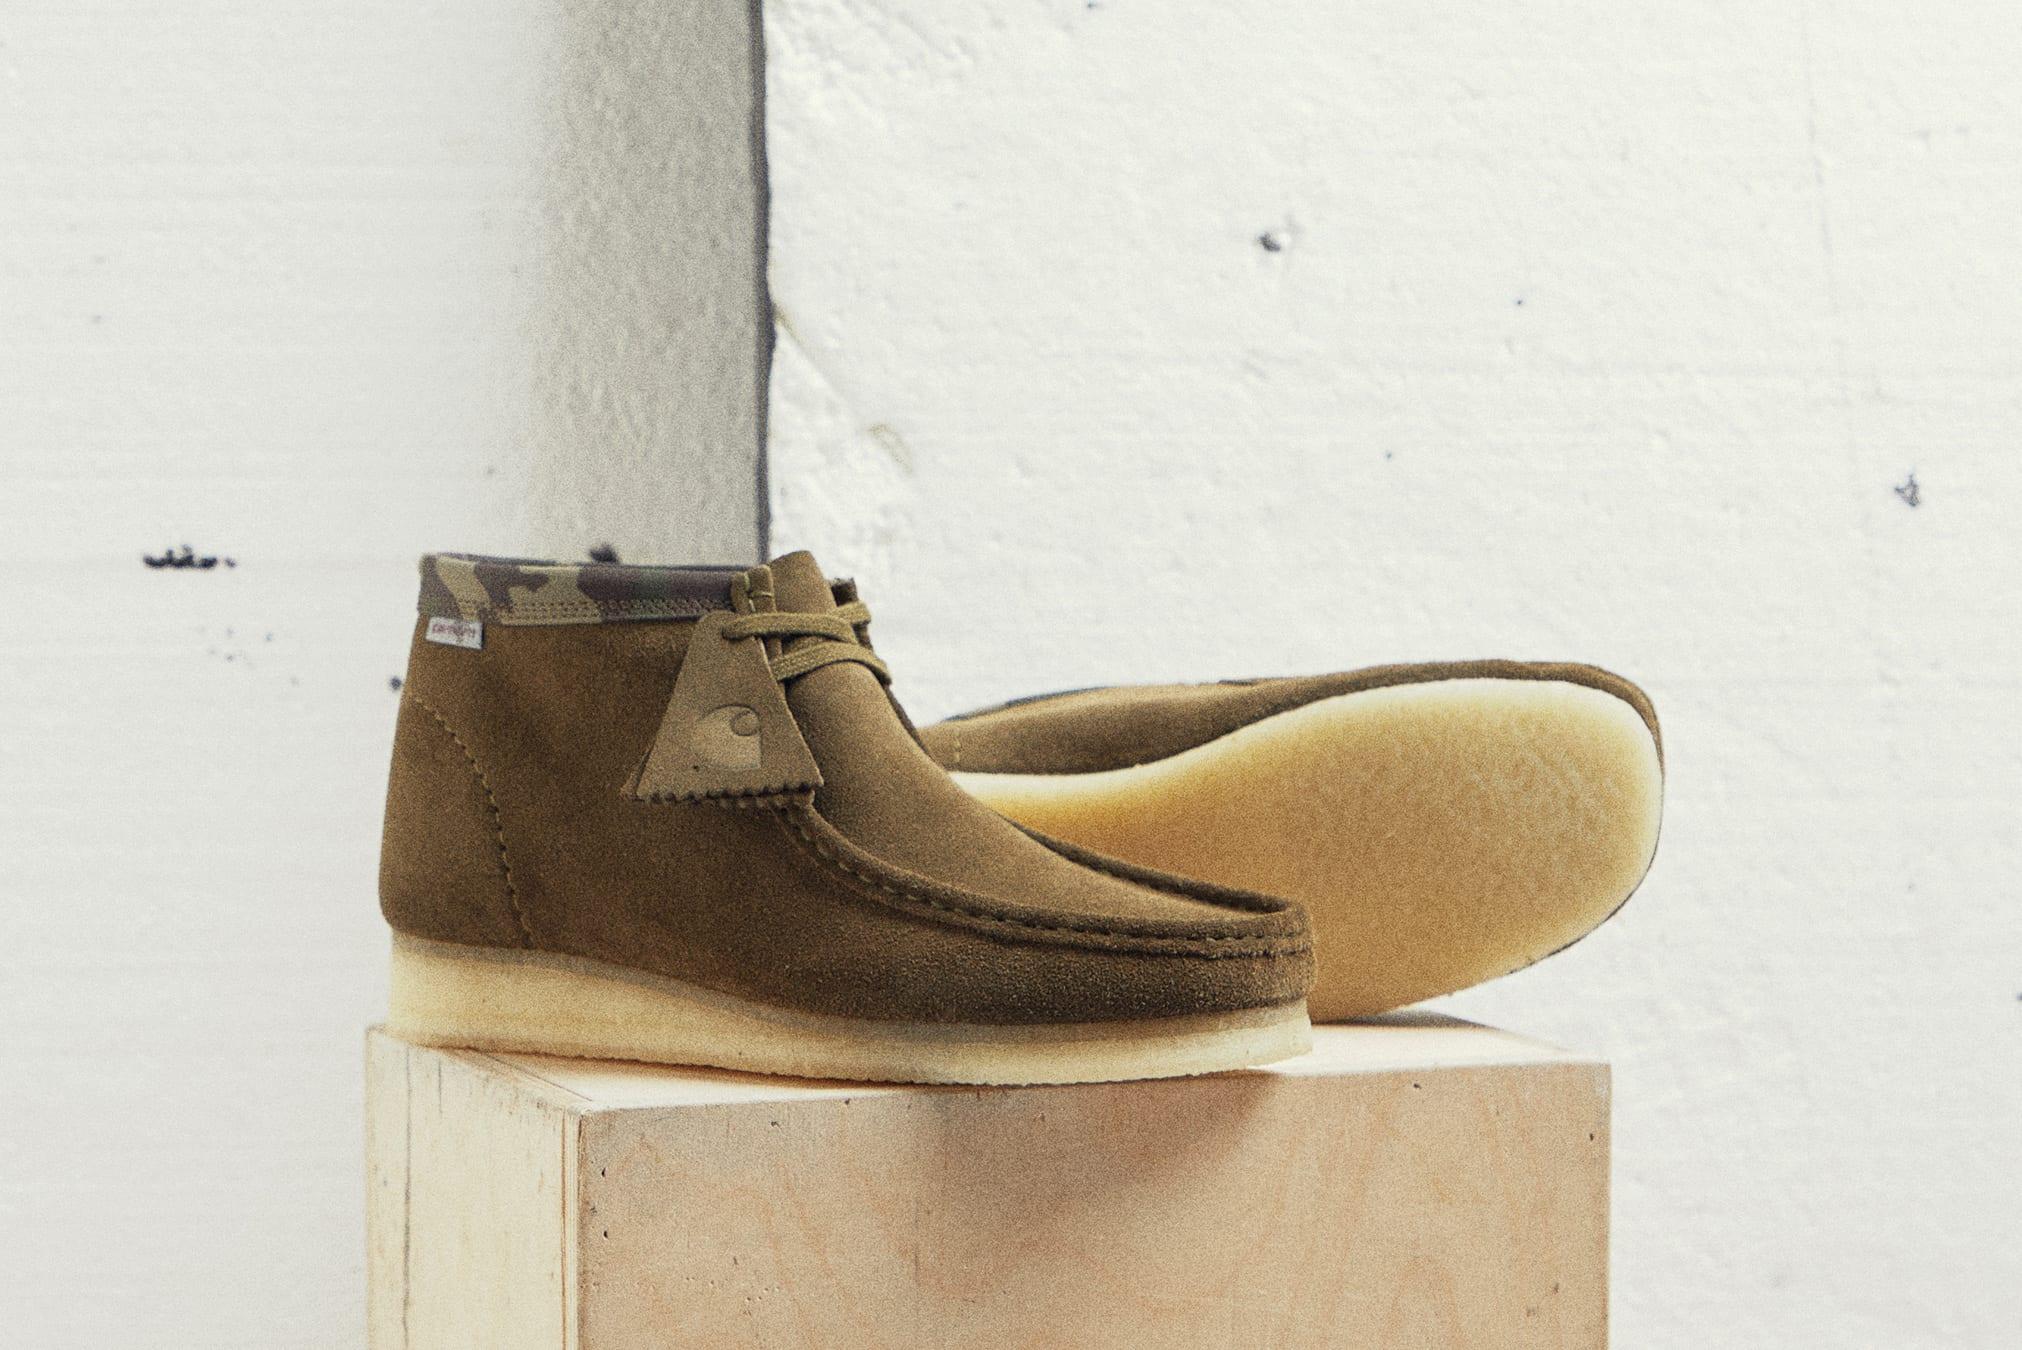 Clarks Originals x Carhartt Wallabee Boot - 26146168